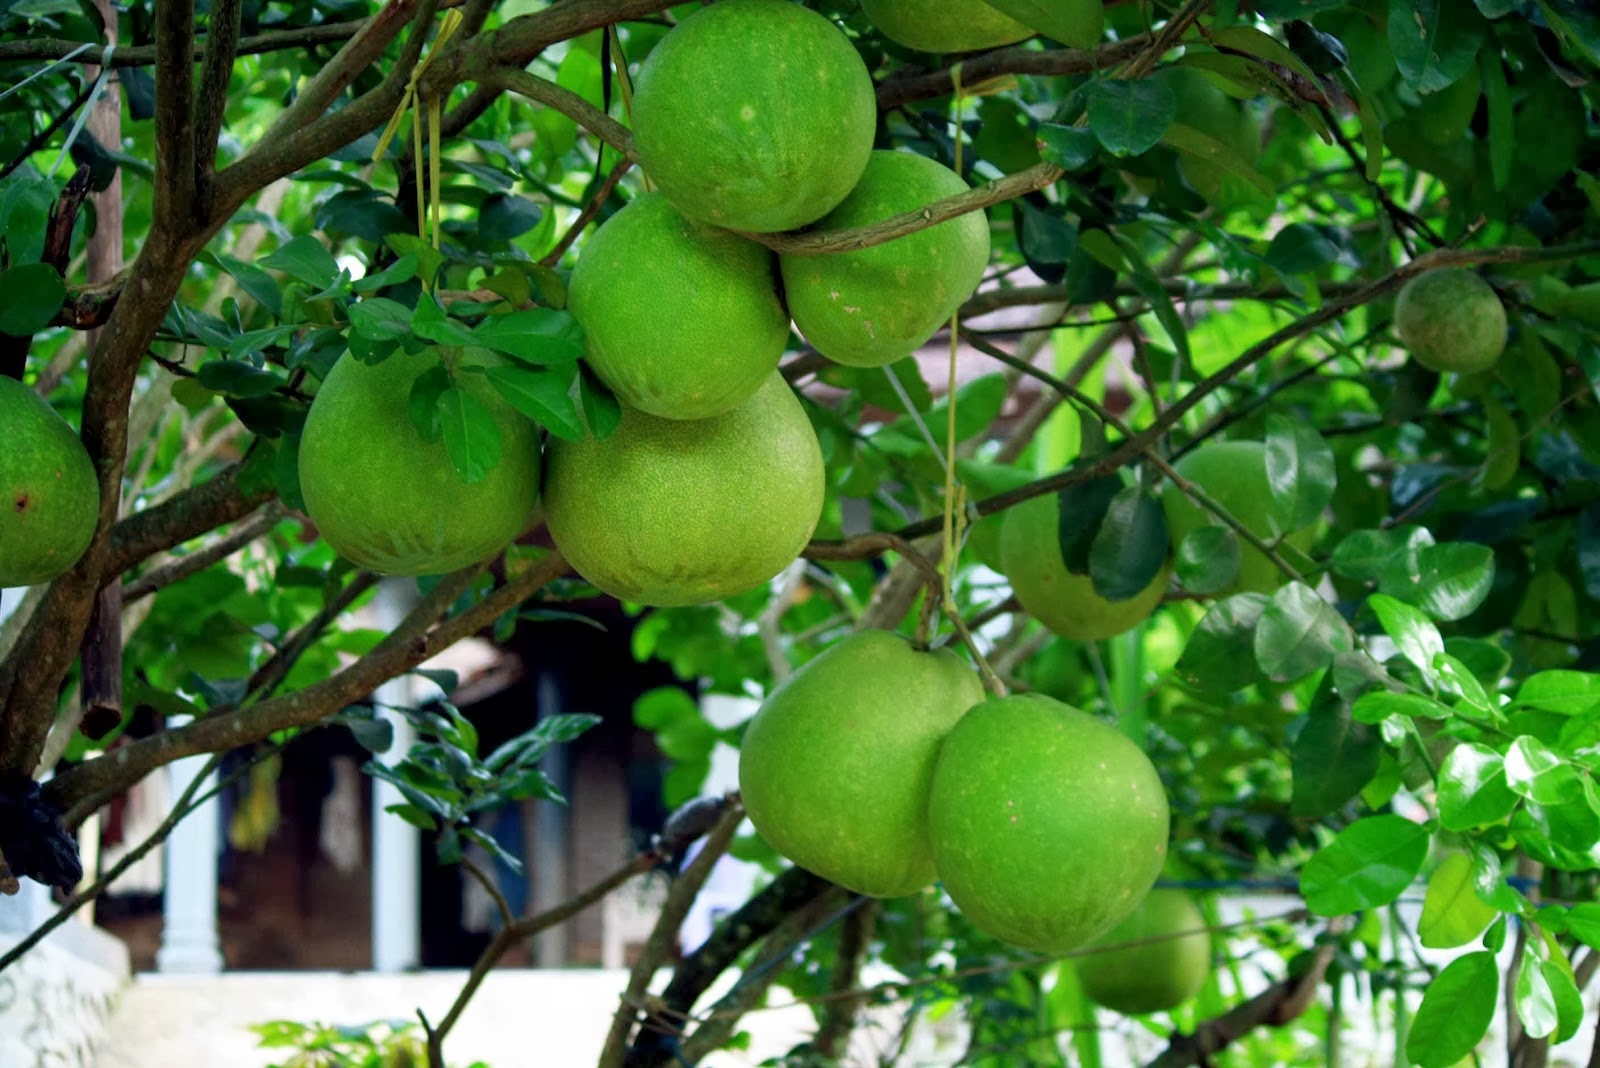 Pohon Buah Jeruk Cangkokan Jeruk Manis Sankis Bali